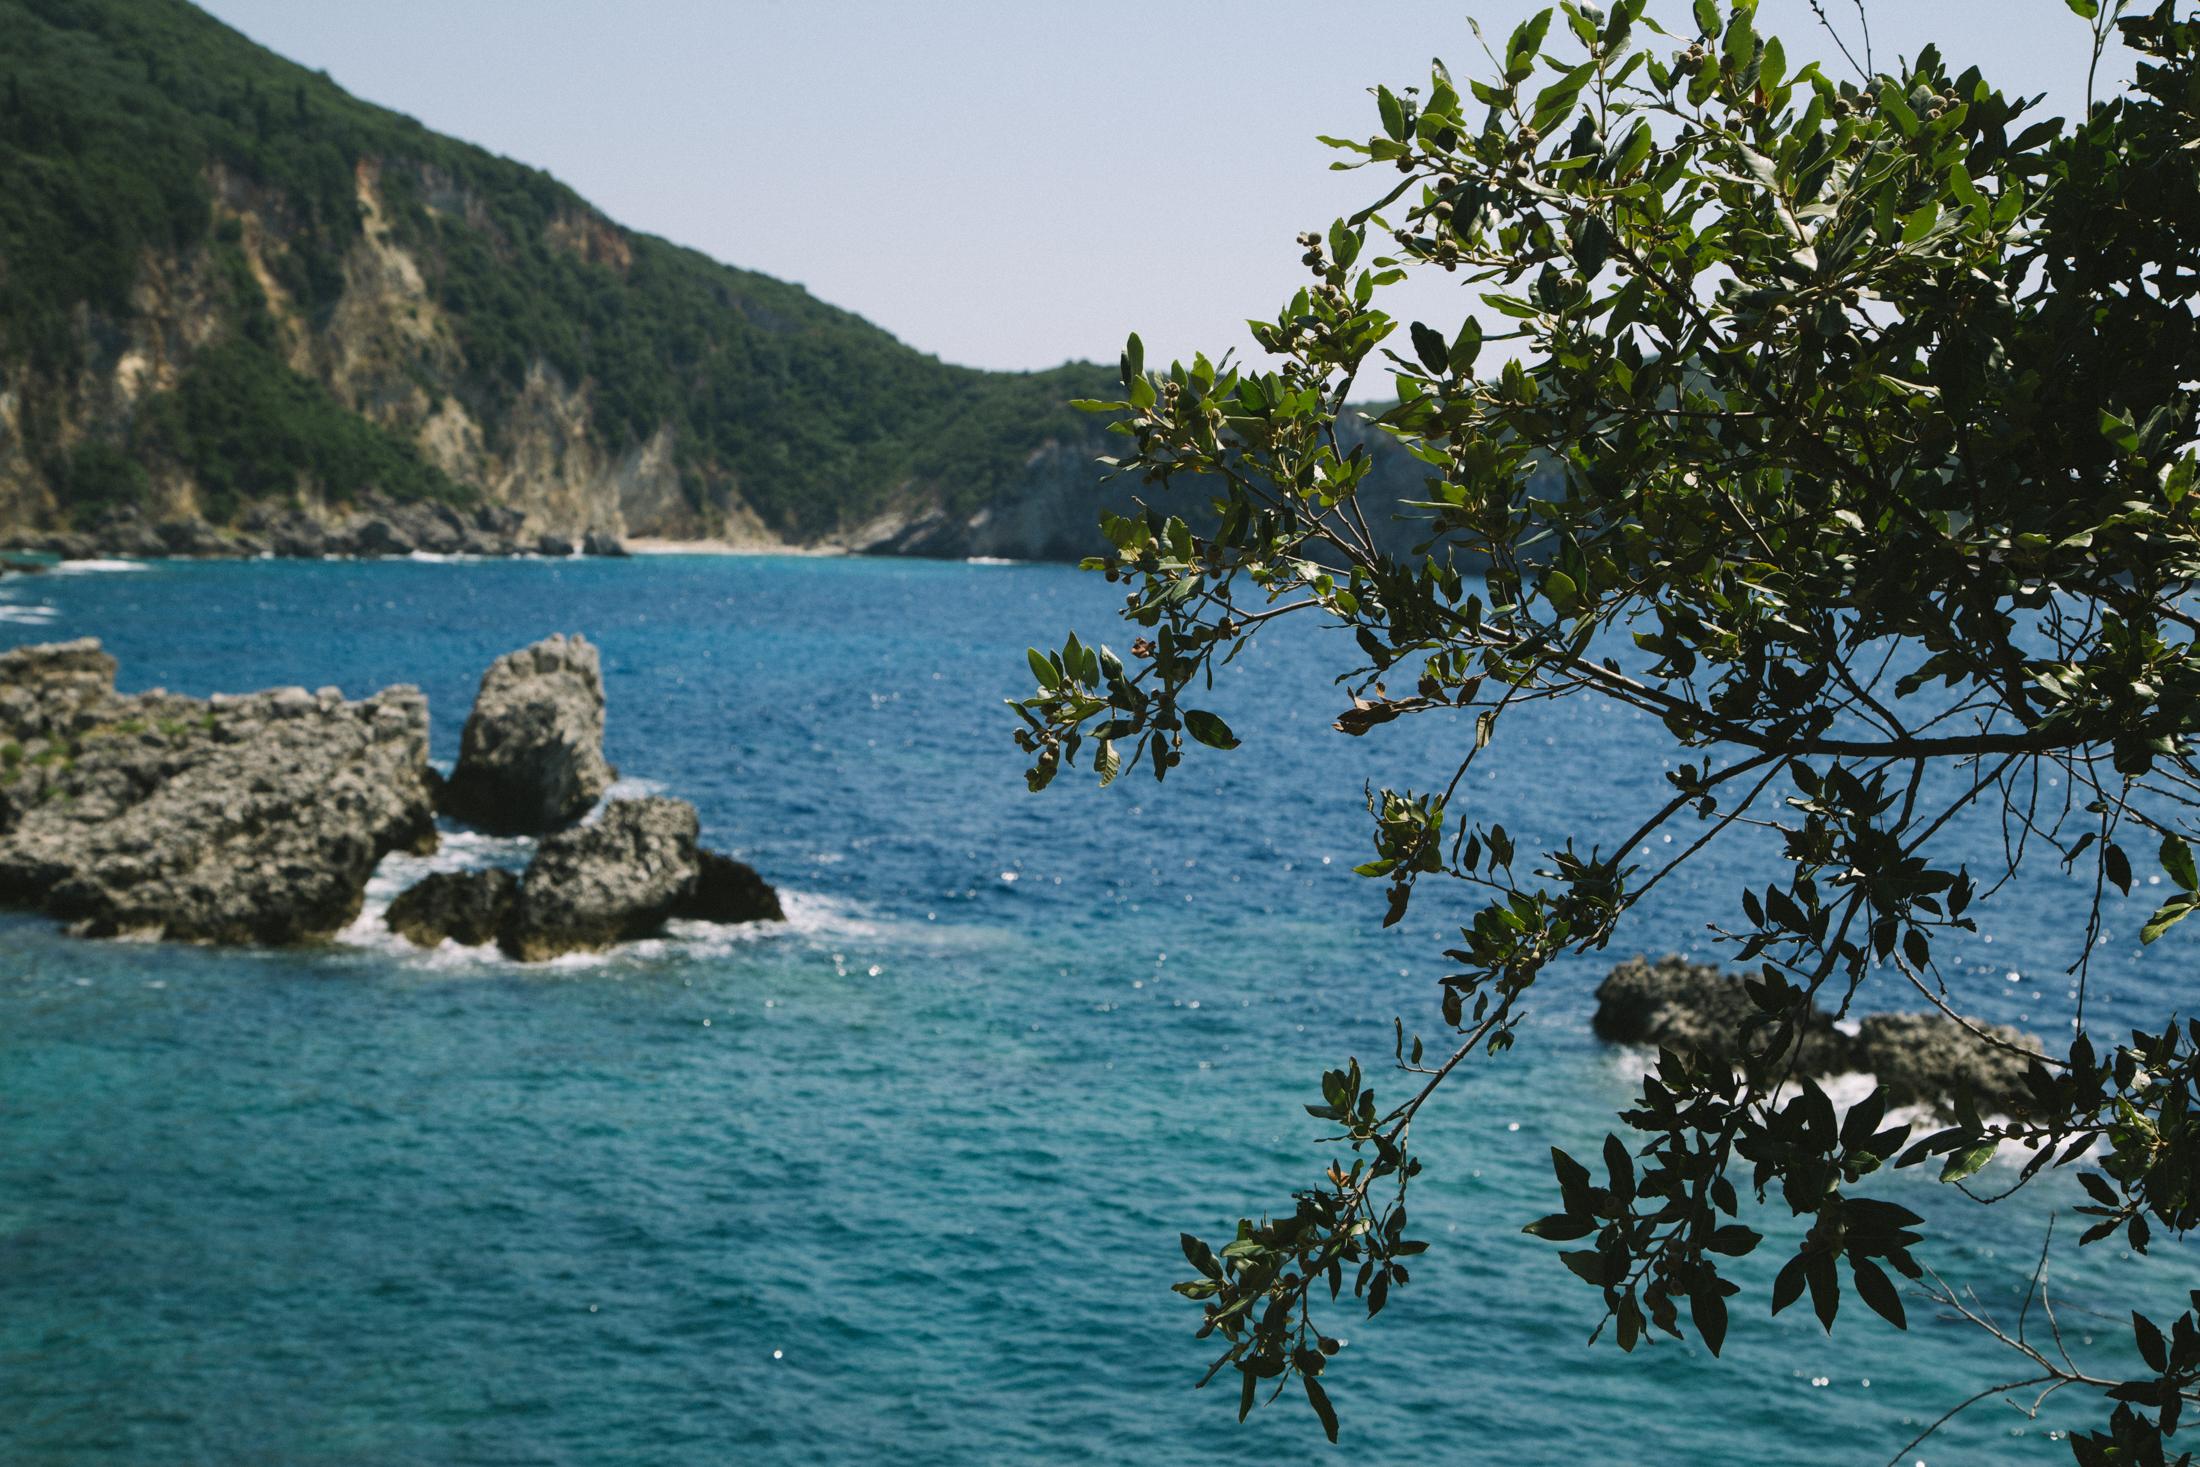 greece-corfu-6426.jpg